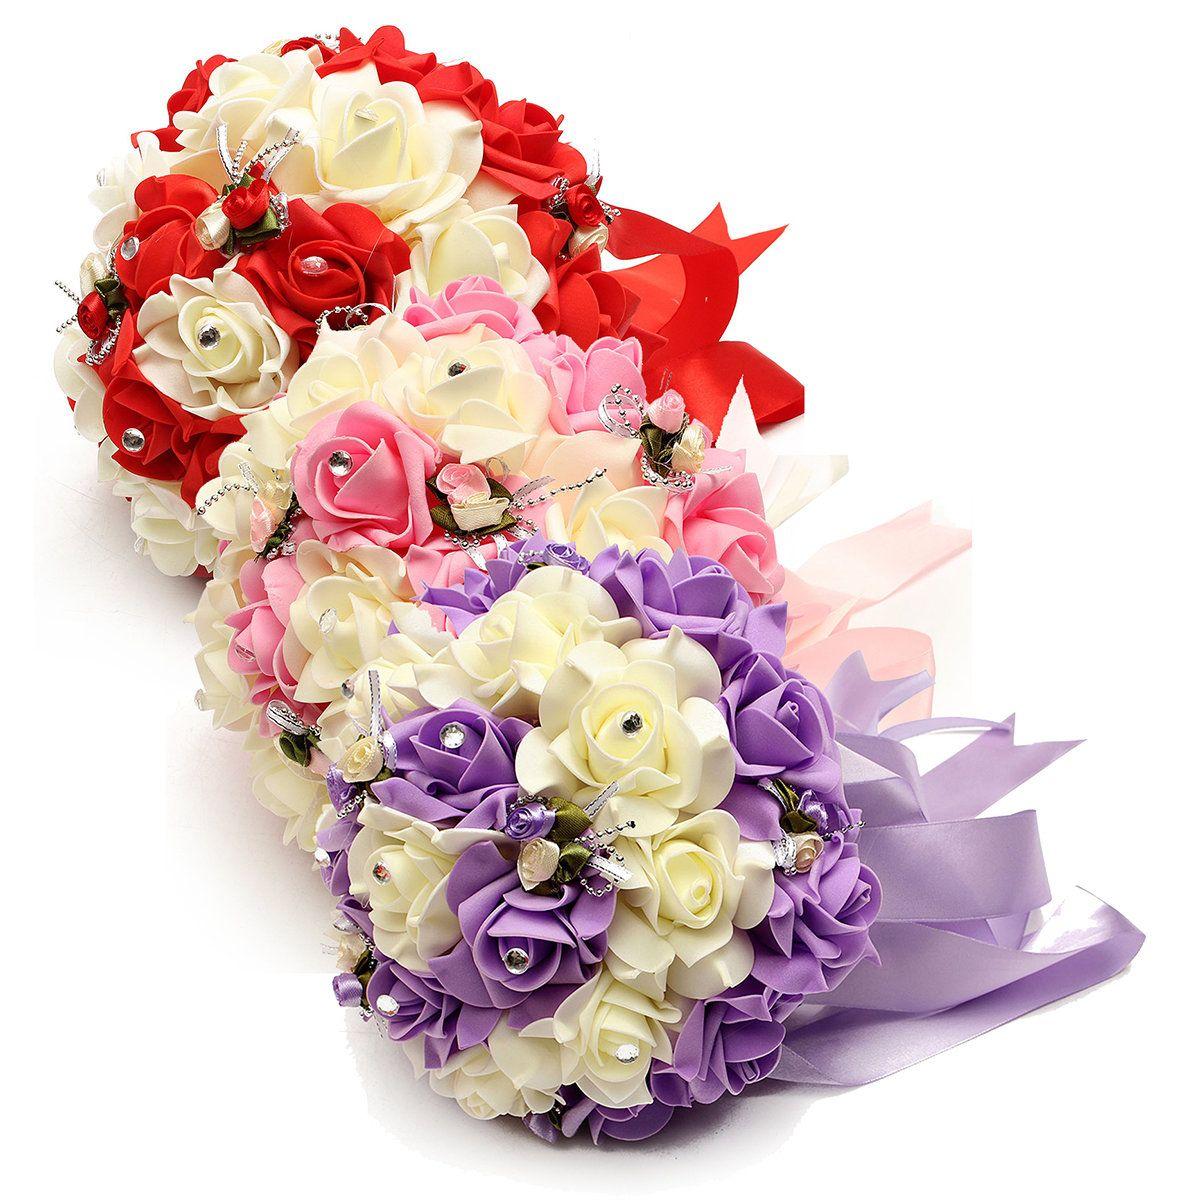 Bride Artificial Foam Roses Bouquet Crystal Ilke Ribbon Wedding